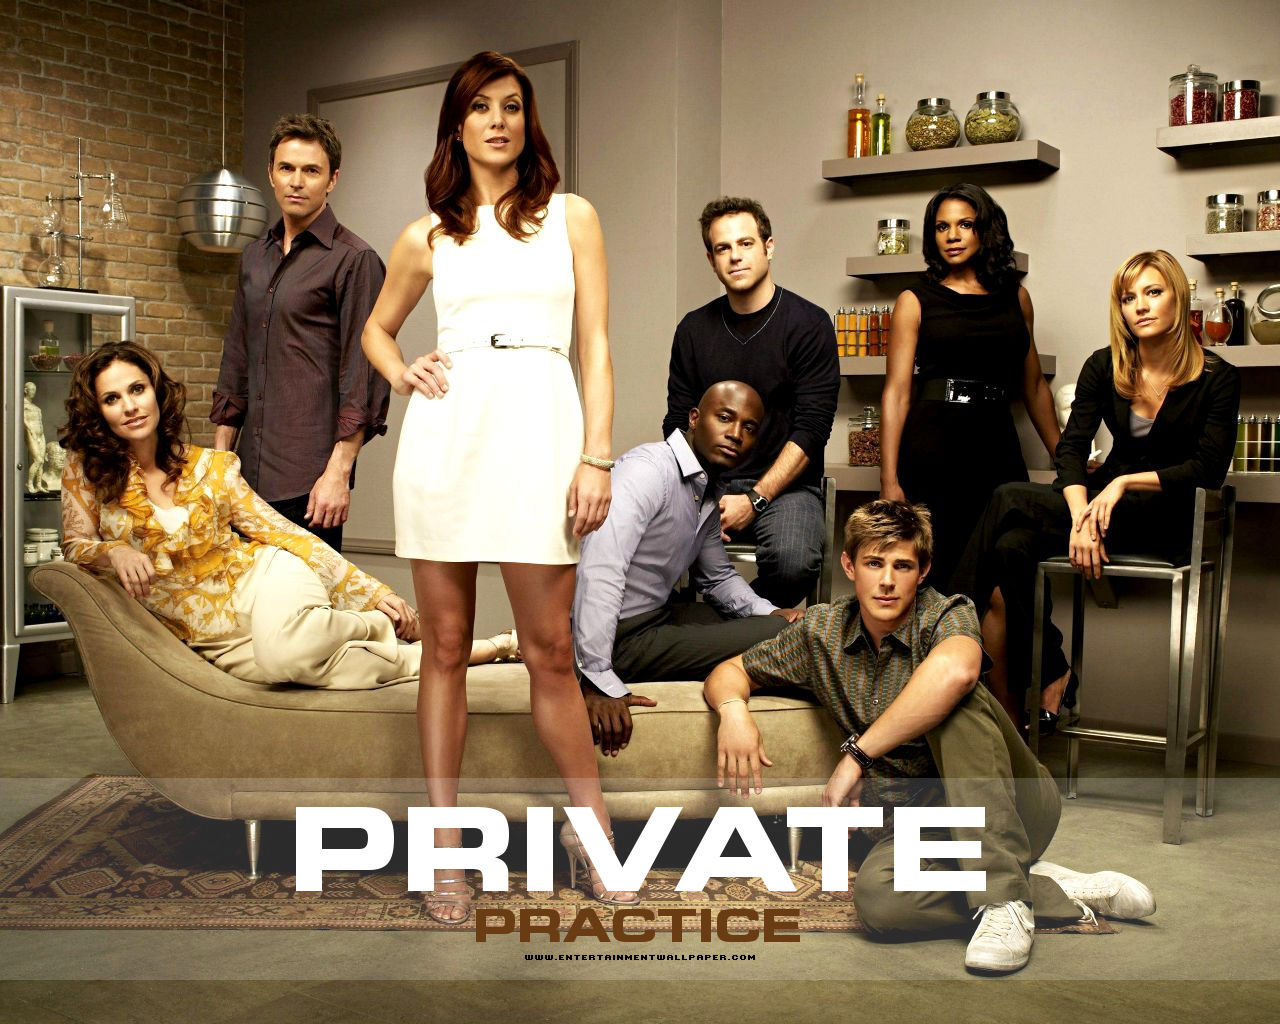 private_practice-3.jpg (1280×1024)